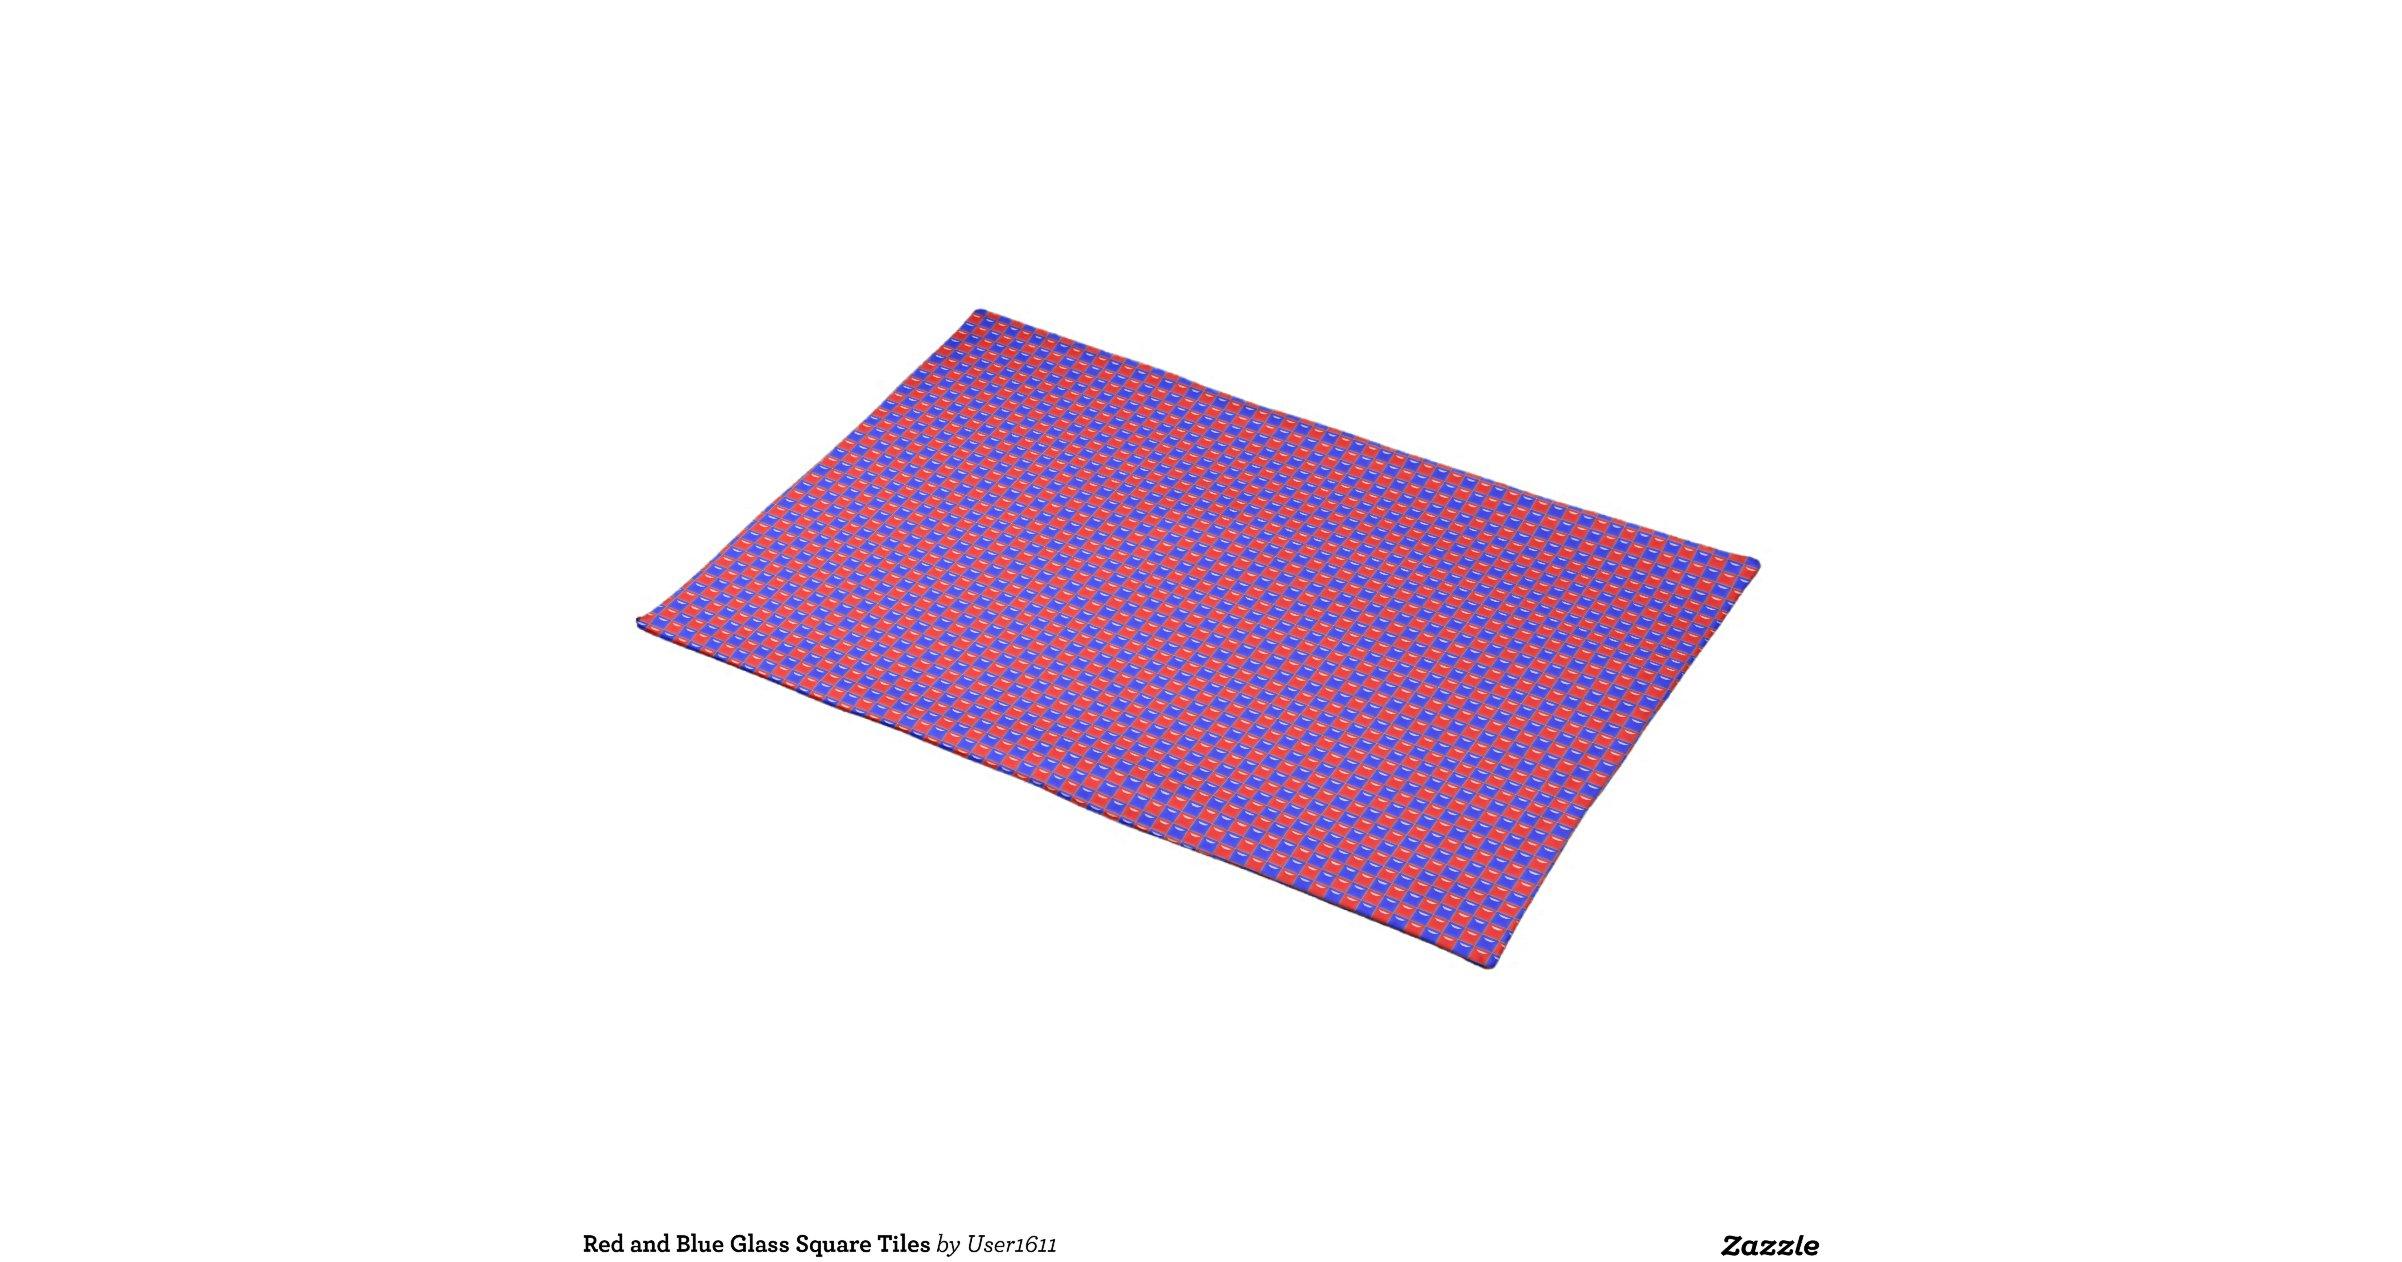 Red and Blue Glass Square Tiles Placemats Zazzle : redandblueglasssquaretilesplacemats r12b22e5d1eb541c1ae75d6cdbe61e0142cfk18byvr1200jpgviewpadding5B04523809523809522C02C0 from www.zazzle.ca size 2468 x 1296 jpeg 308kB